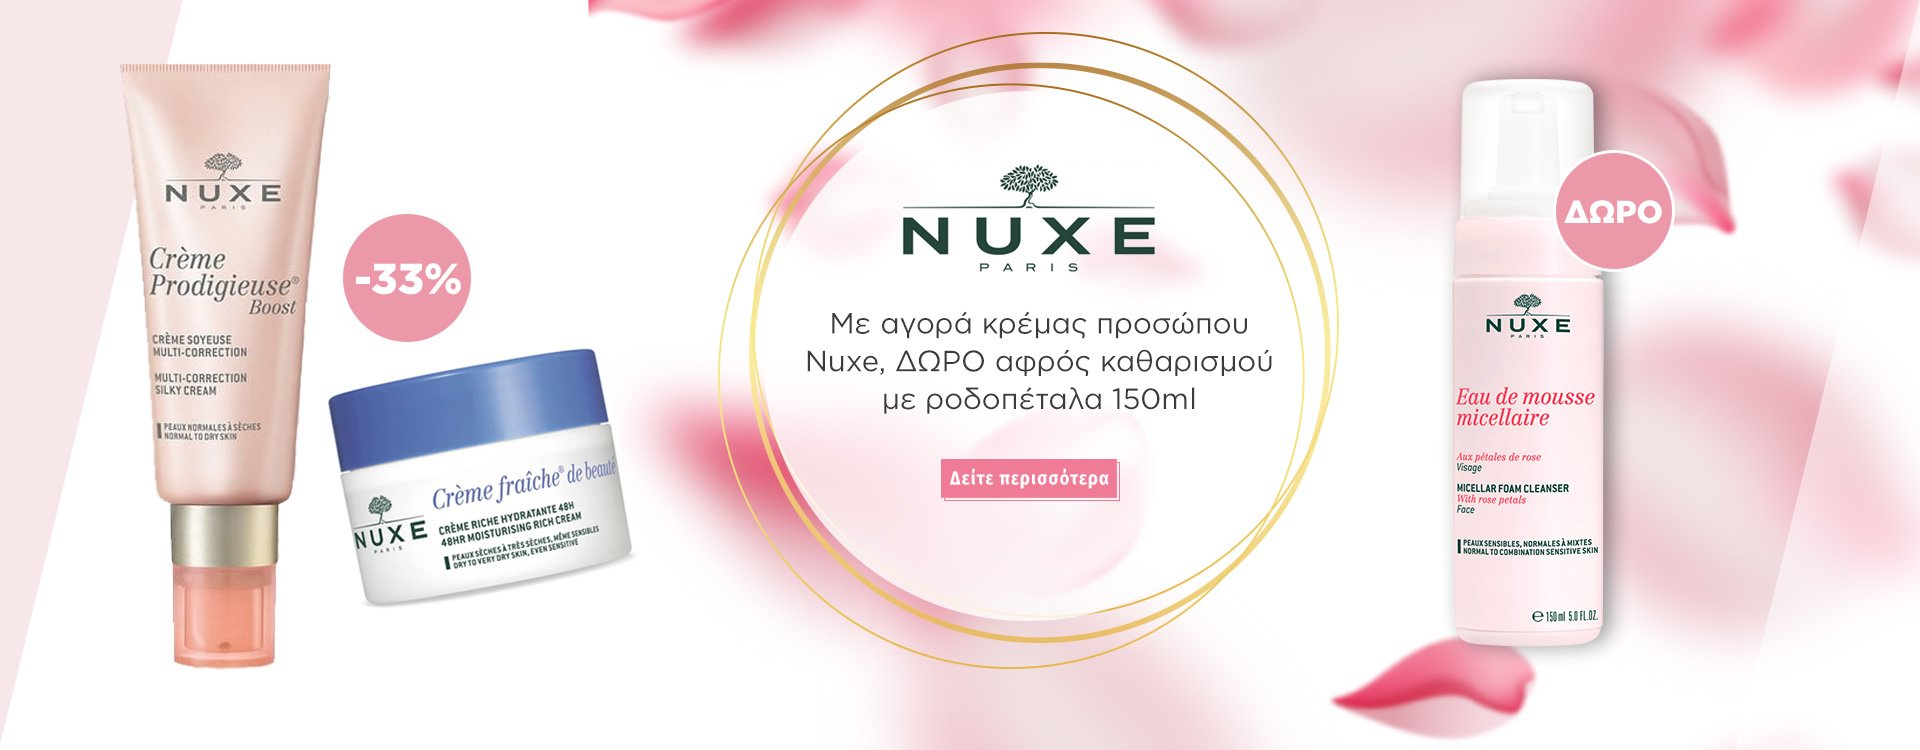 Nuxe+Δώρο Αφρος καθαρισμου